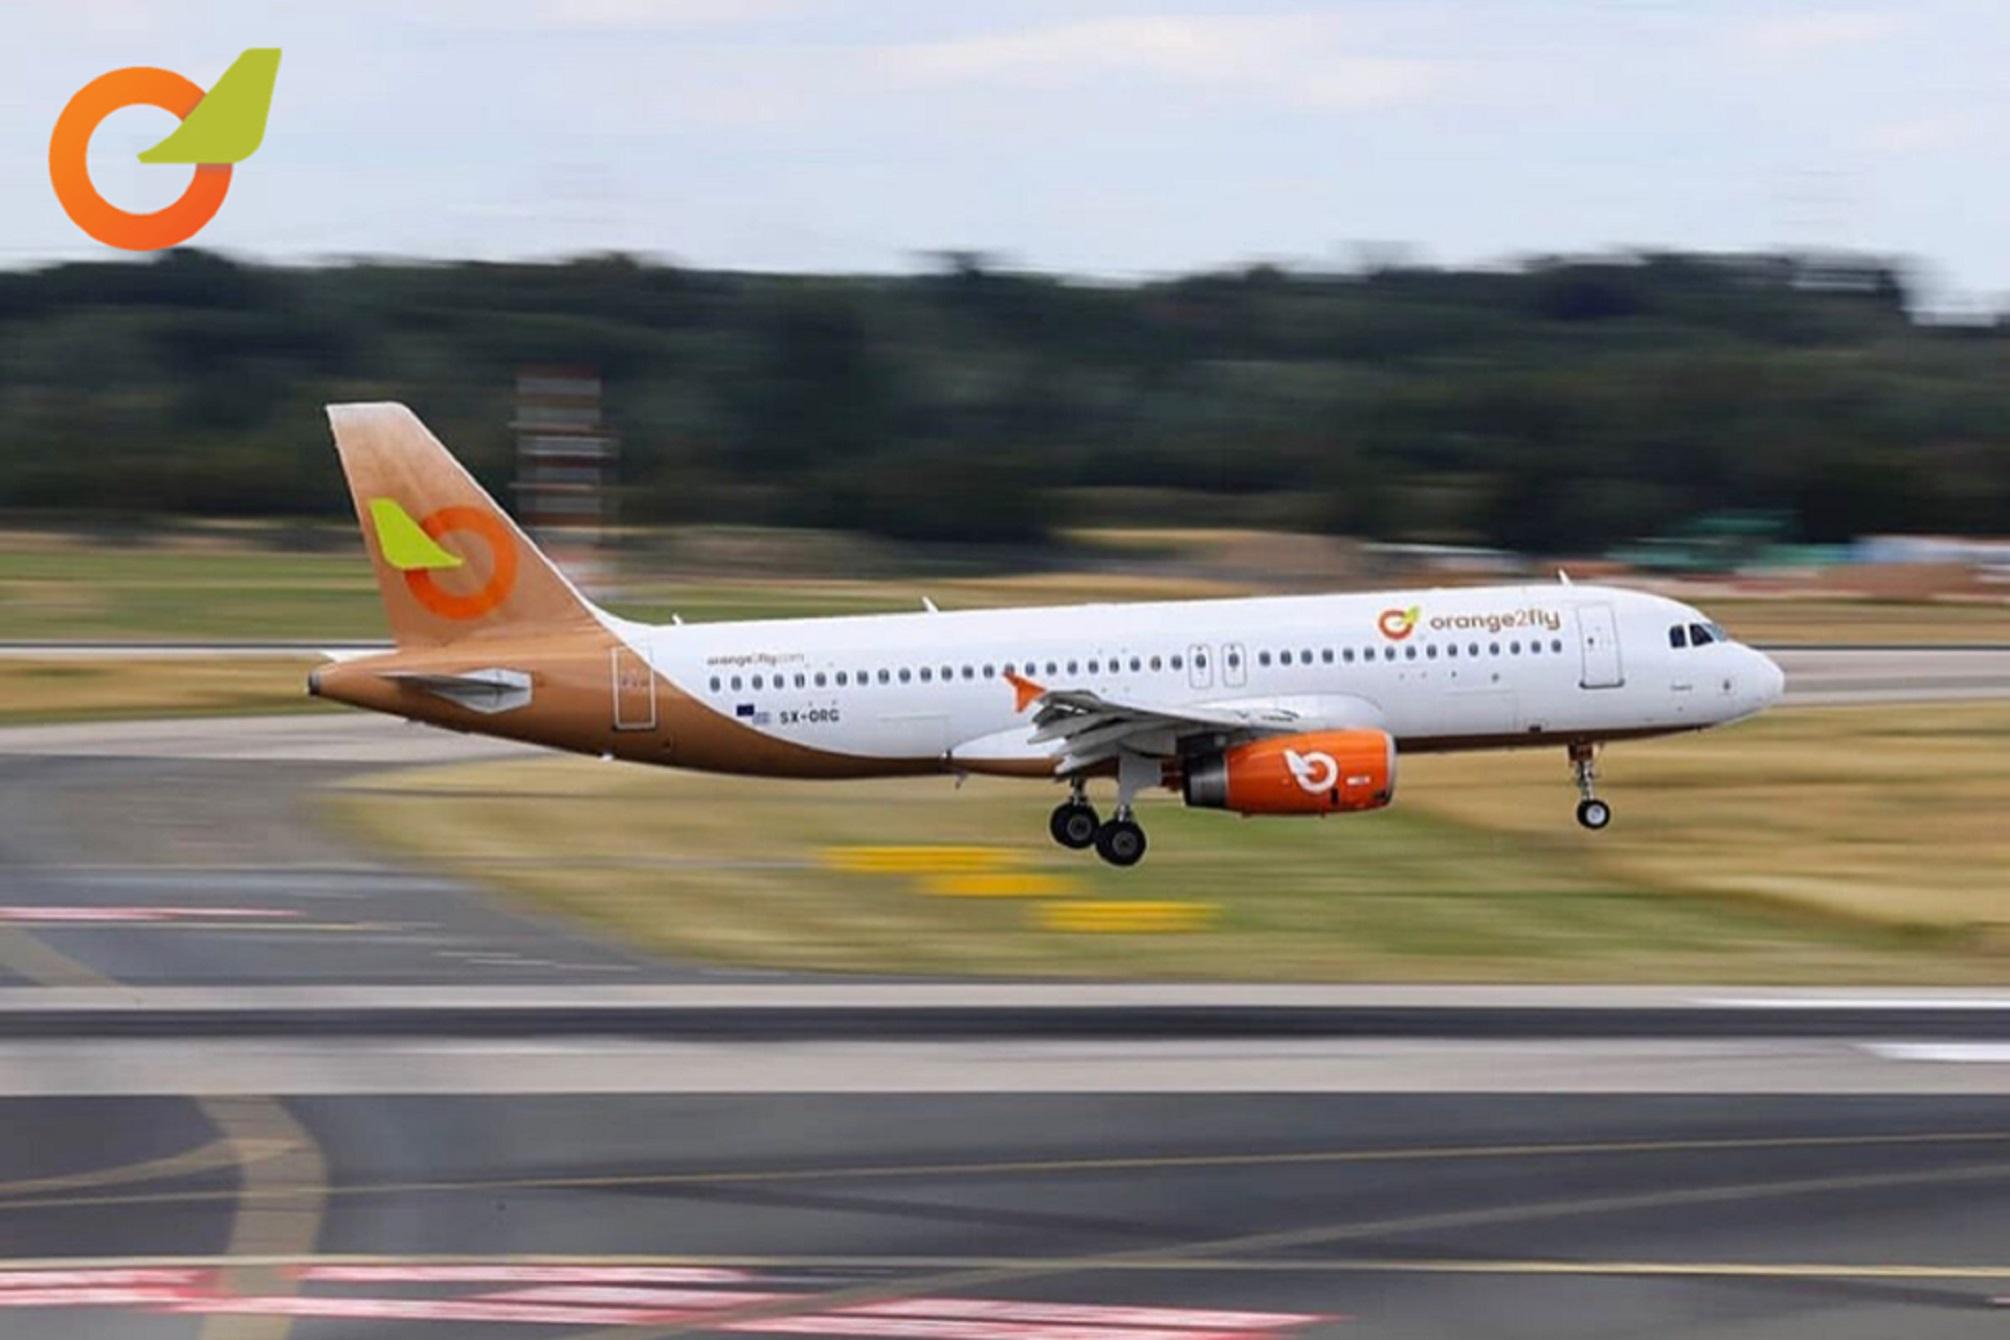 Orange2fly: Ποια είναι η ελληνική αεροπορική εταιρεία που κατέθεσε αίτηση πτώχευσης